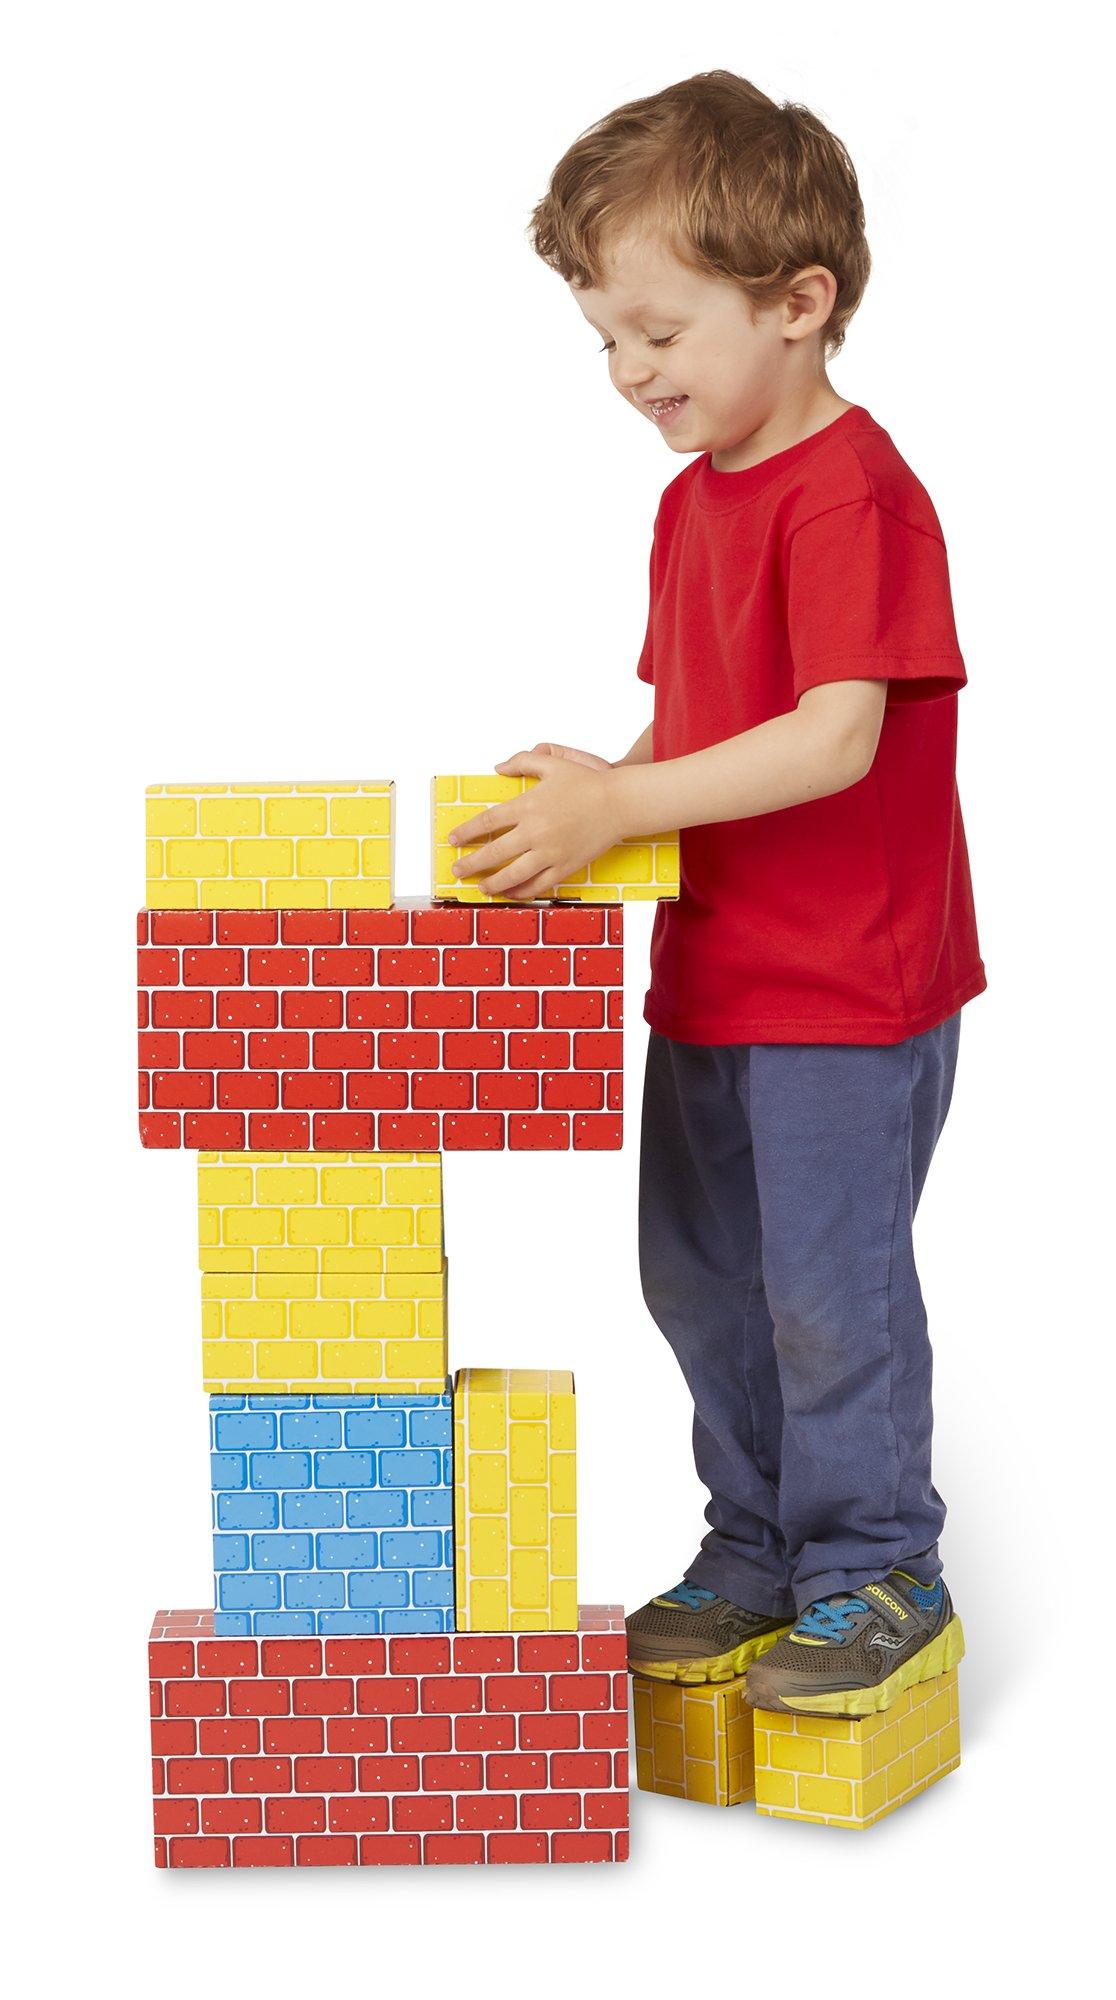 Melissa & Doug Extra-Thick Cardboard Building Blocks - 24 Blocks in 3 Sizes by Melissa & Doug (Image #2)